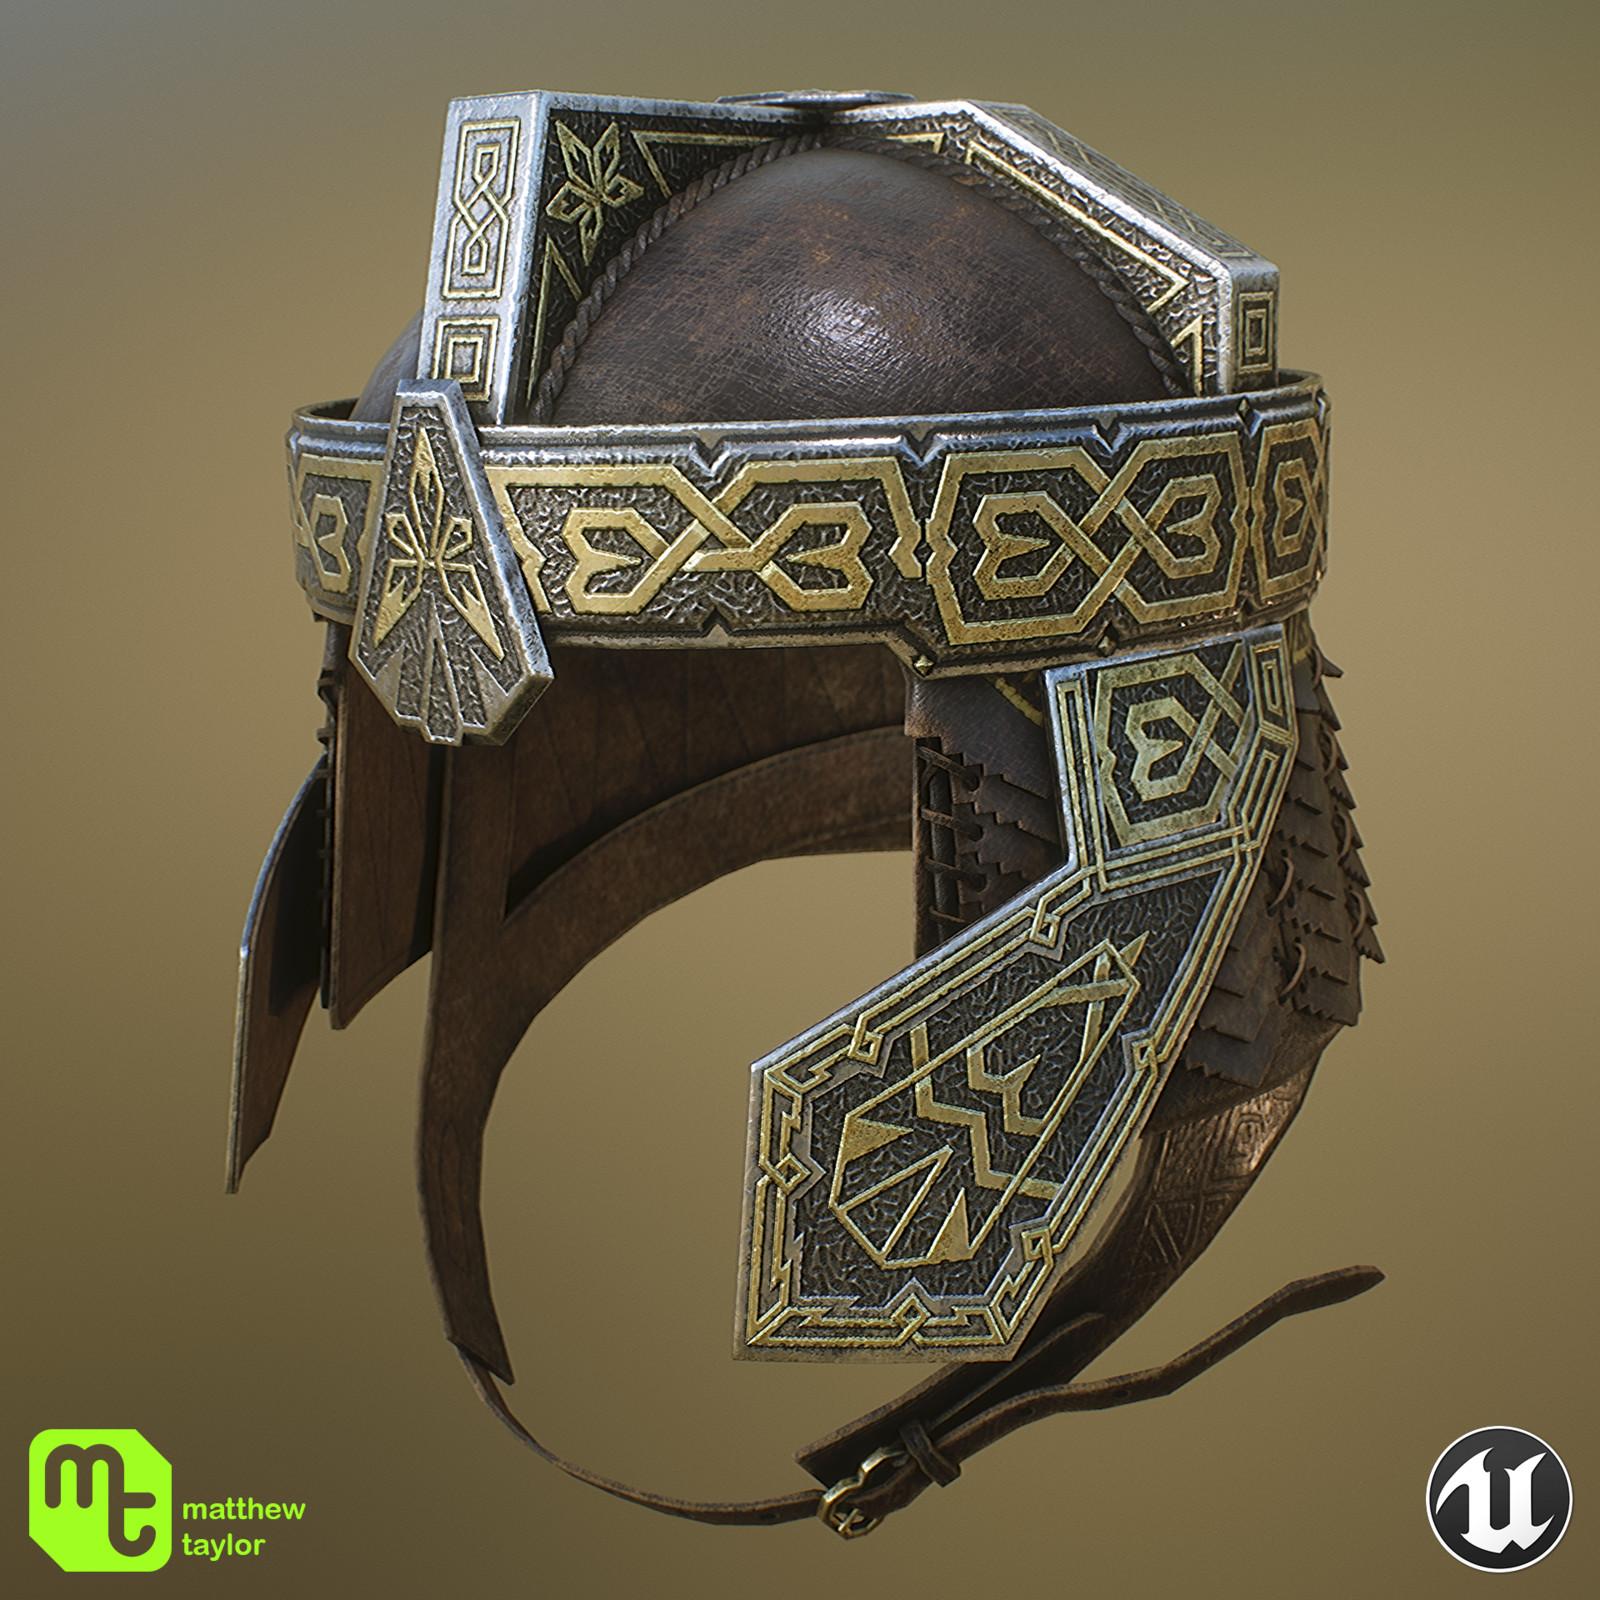 Gimli's Helmet - rendered in Unreal Engine 4.